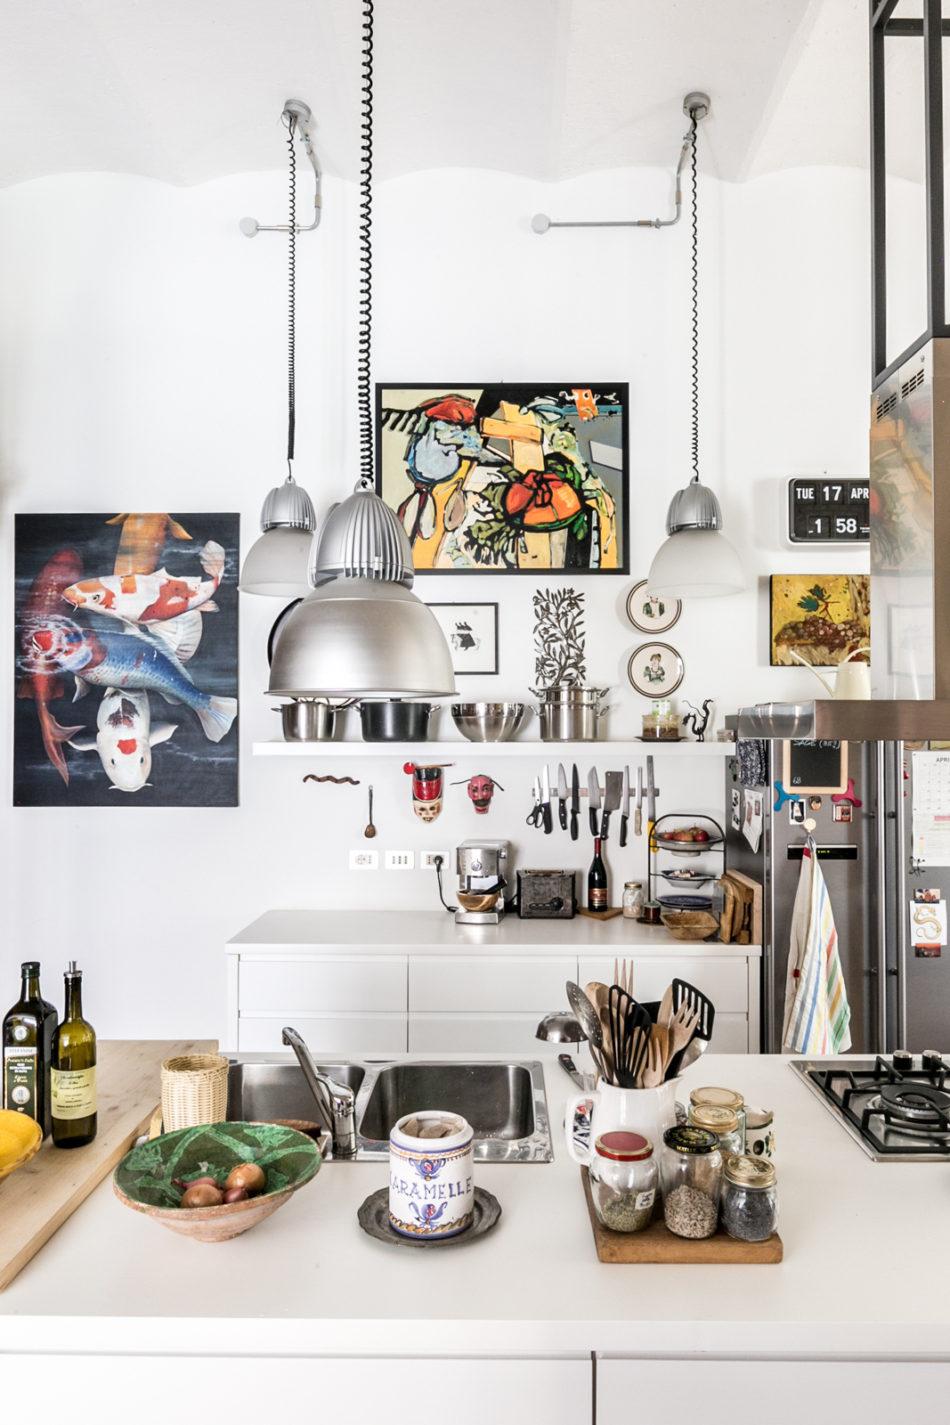 Artwork adorns the kitchen walls